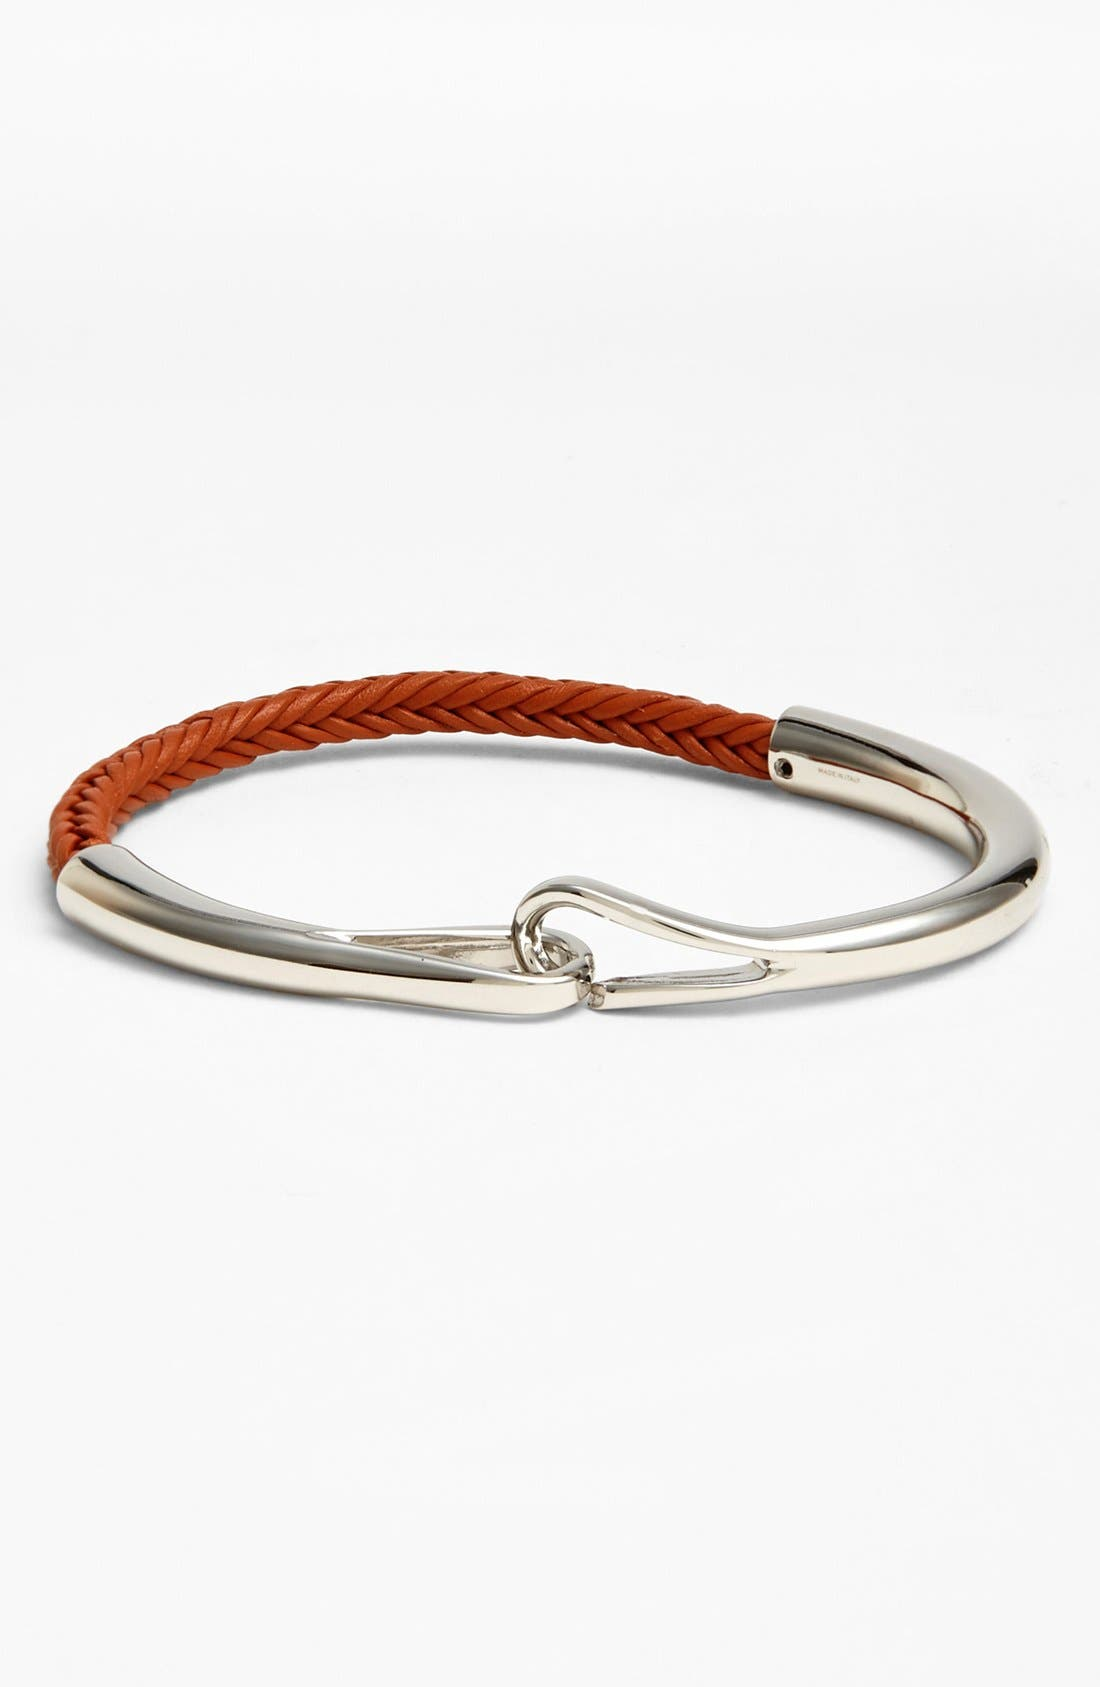 Main Image - Salvatore Ferragamo Leather Bracelet